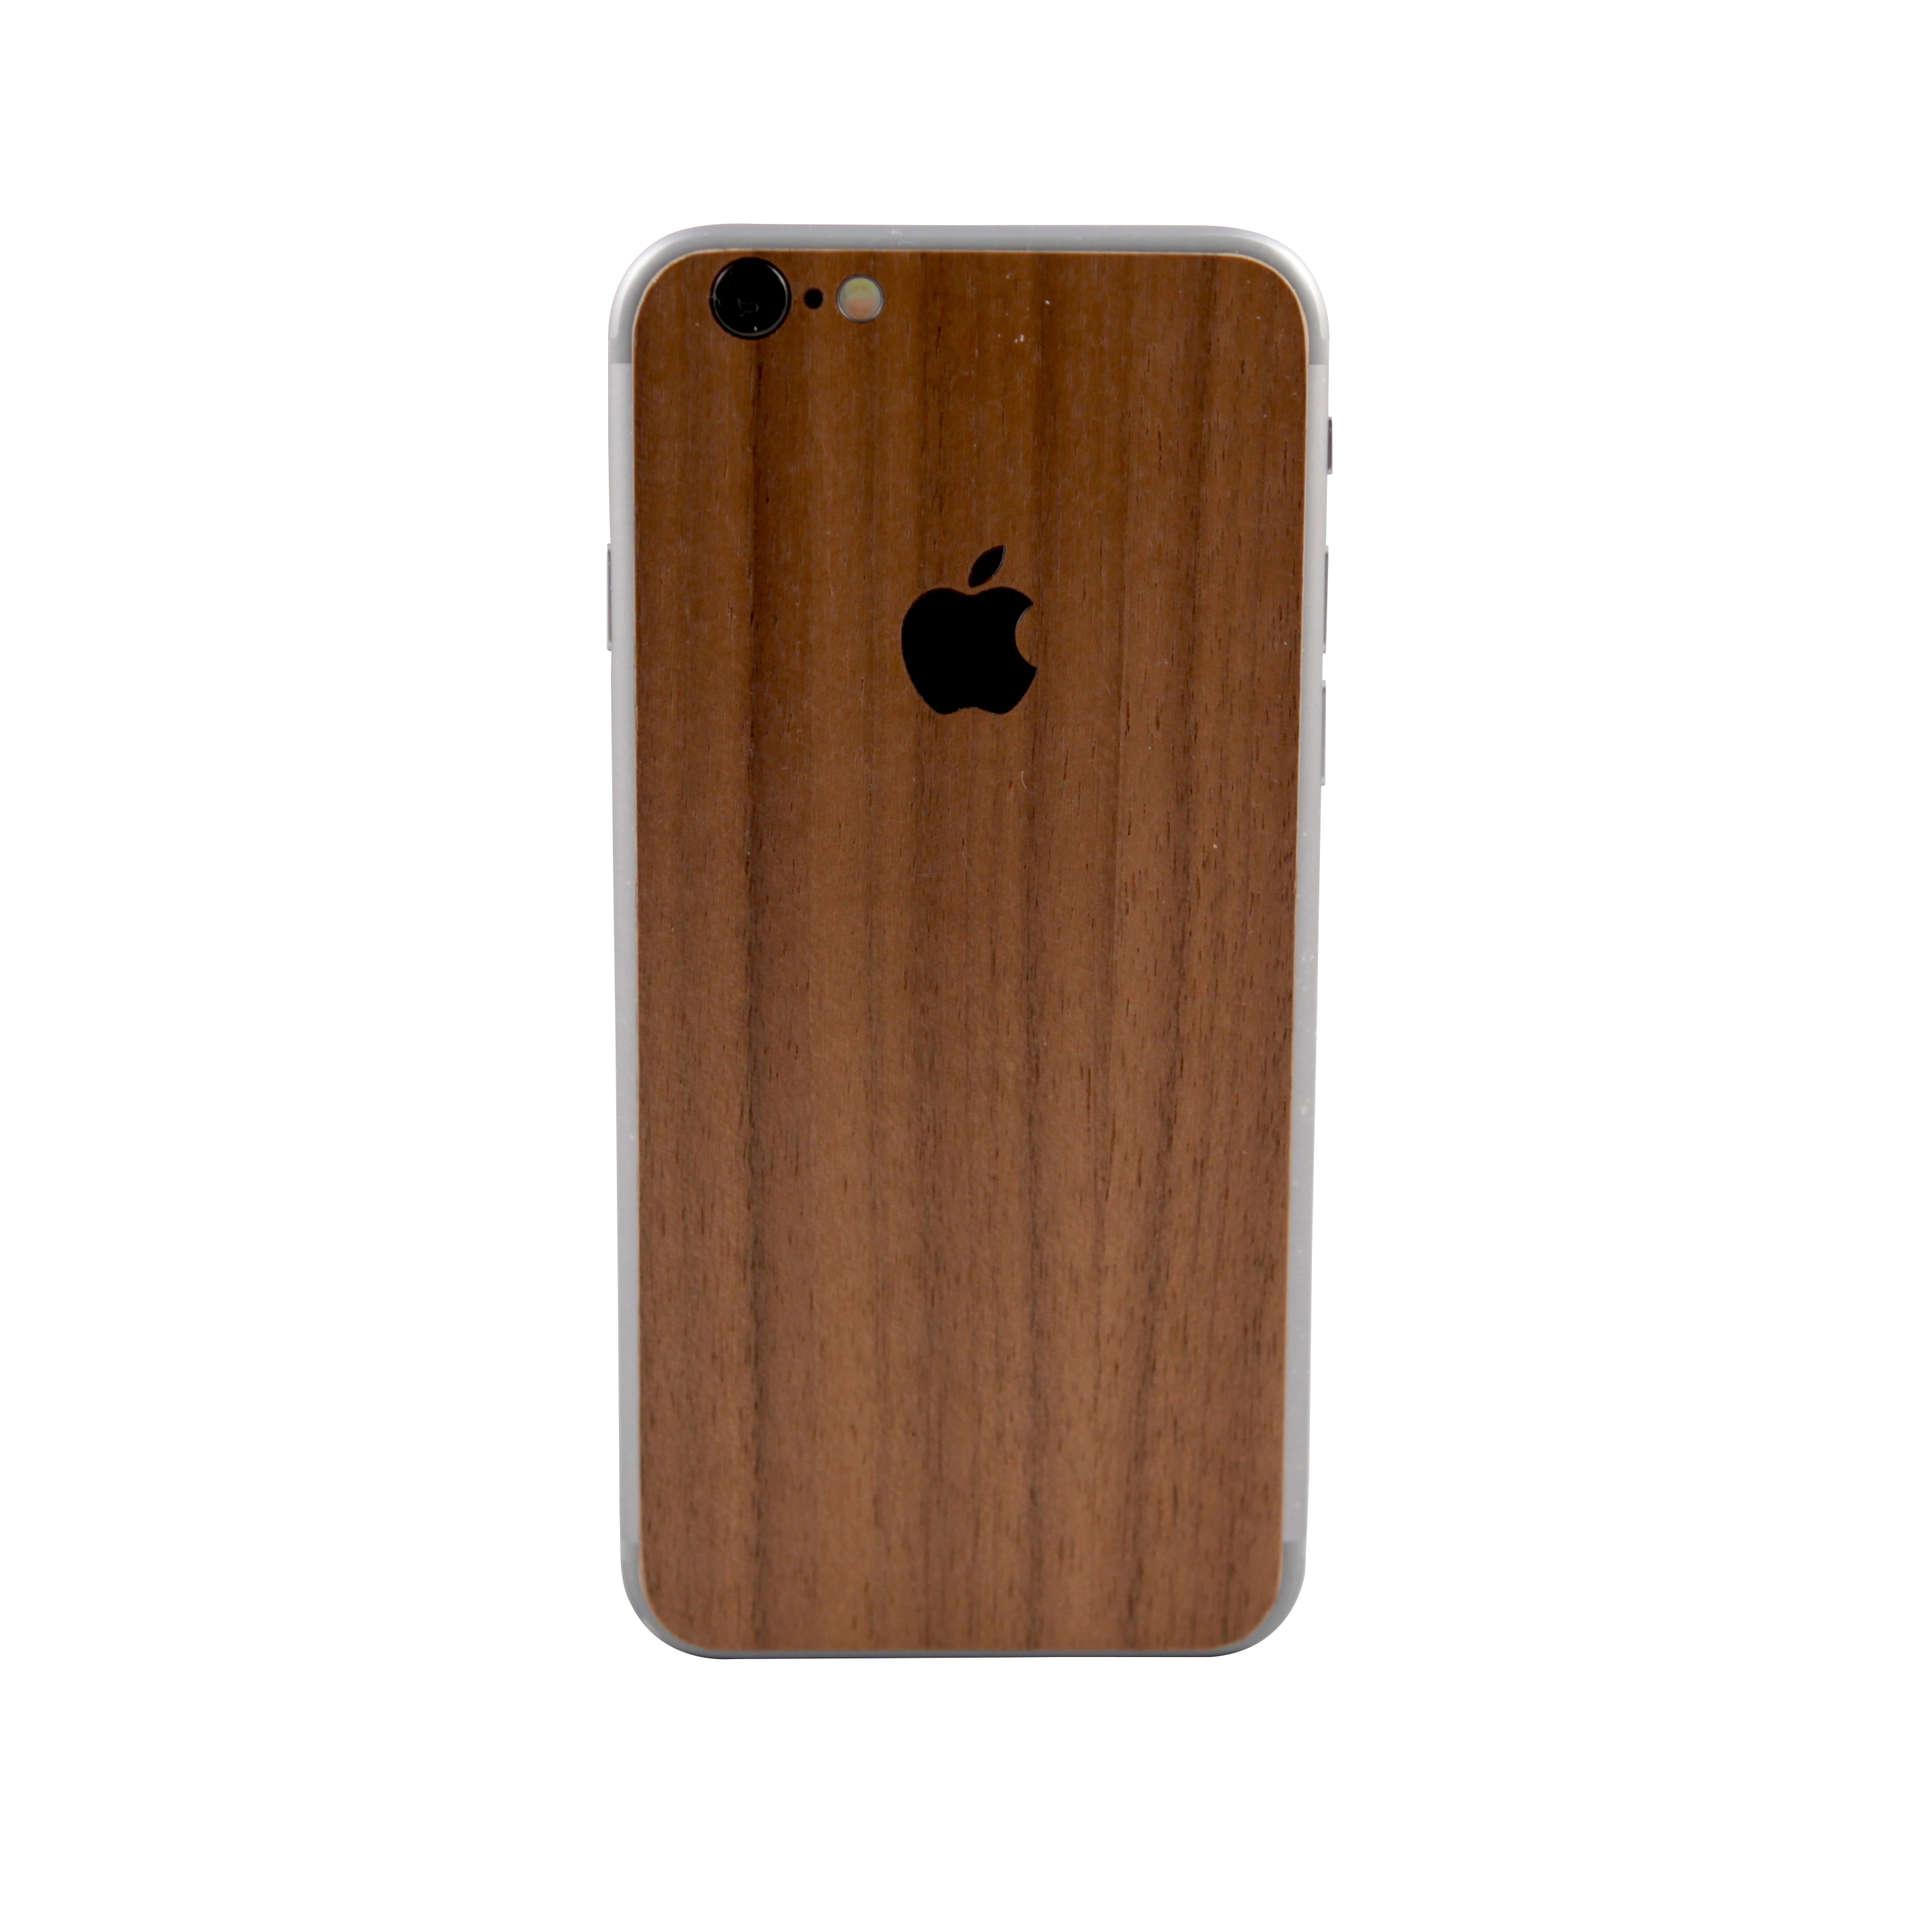 iPhone 6 Natural Slickwraps